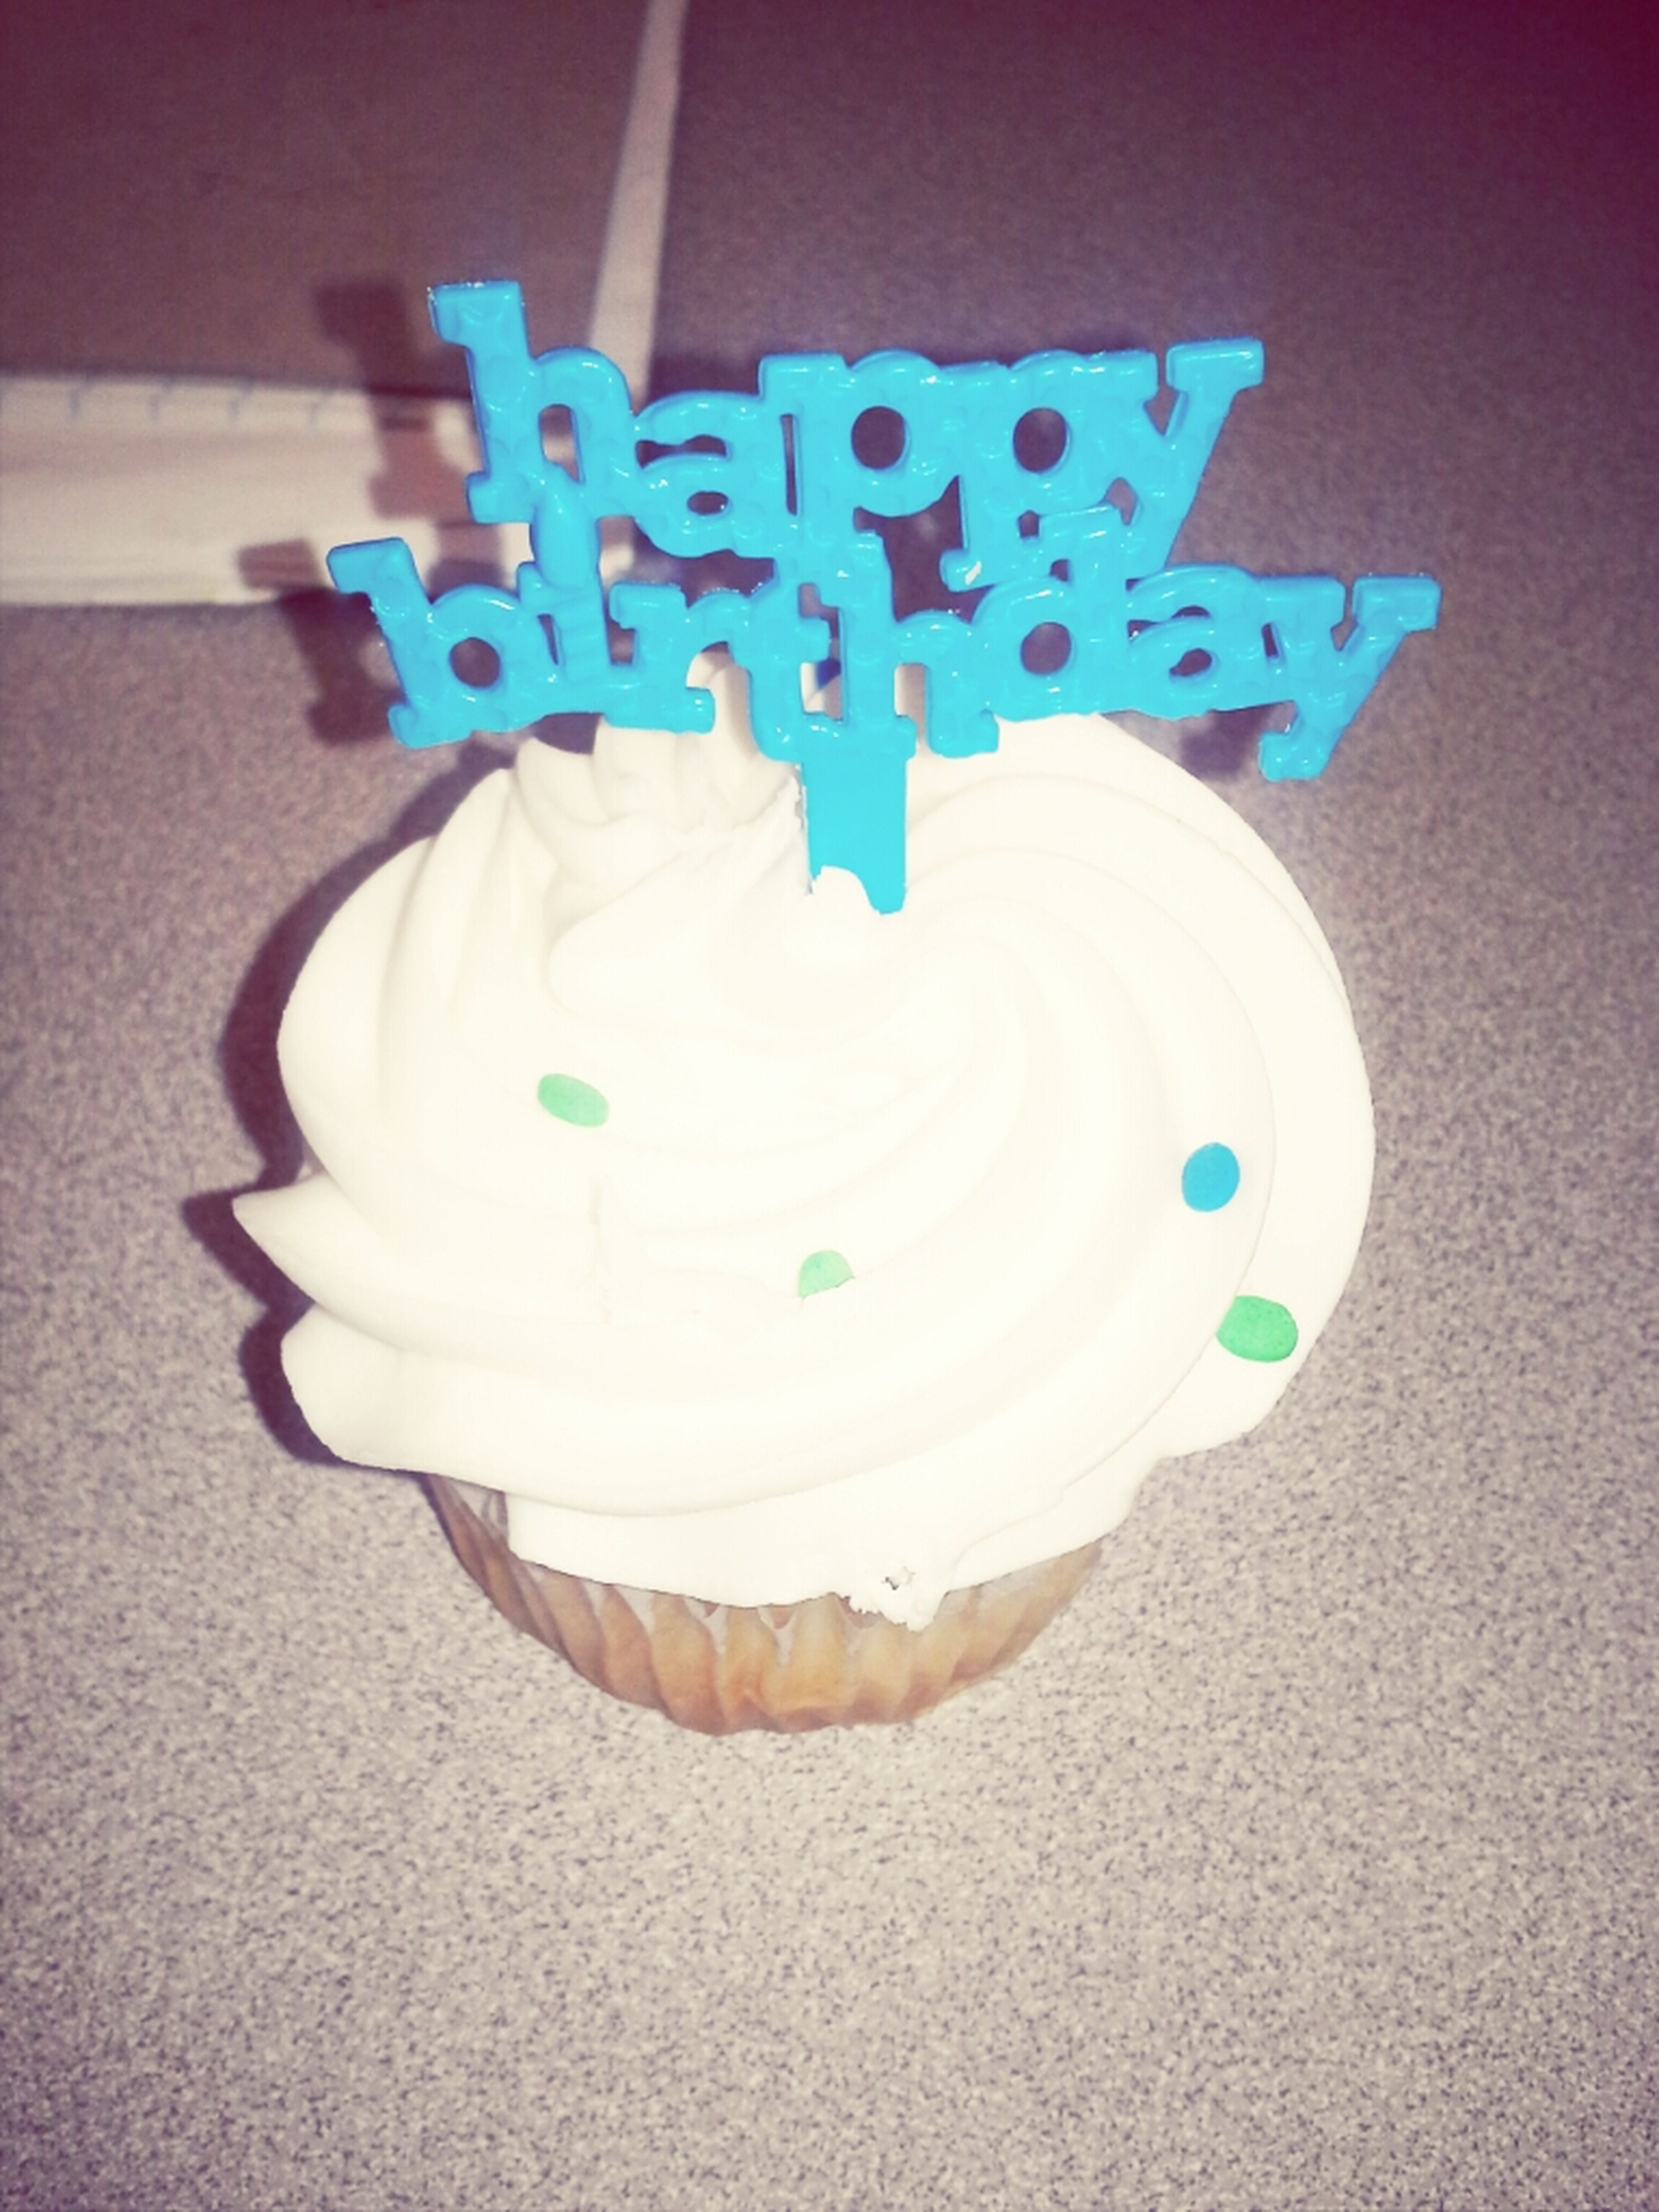 Happy Birthday To Everyone Birthday Who's Today!